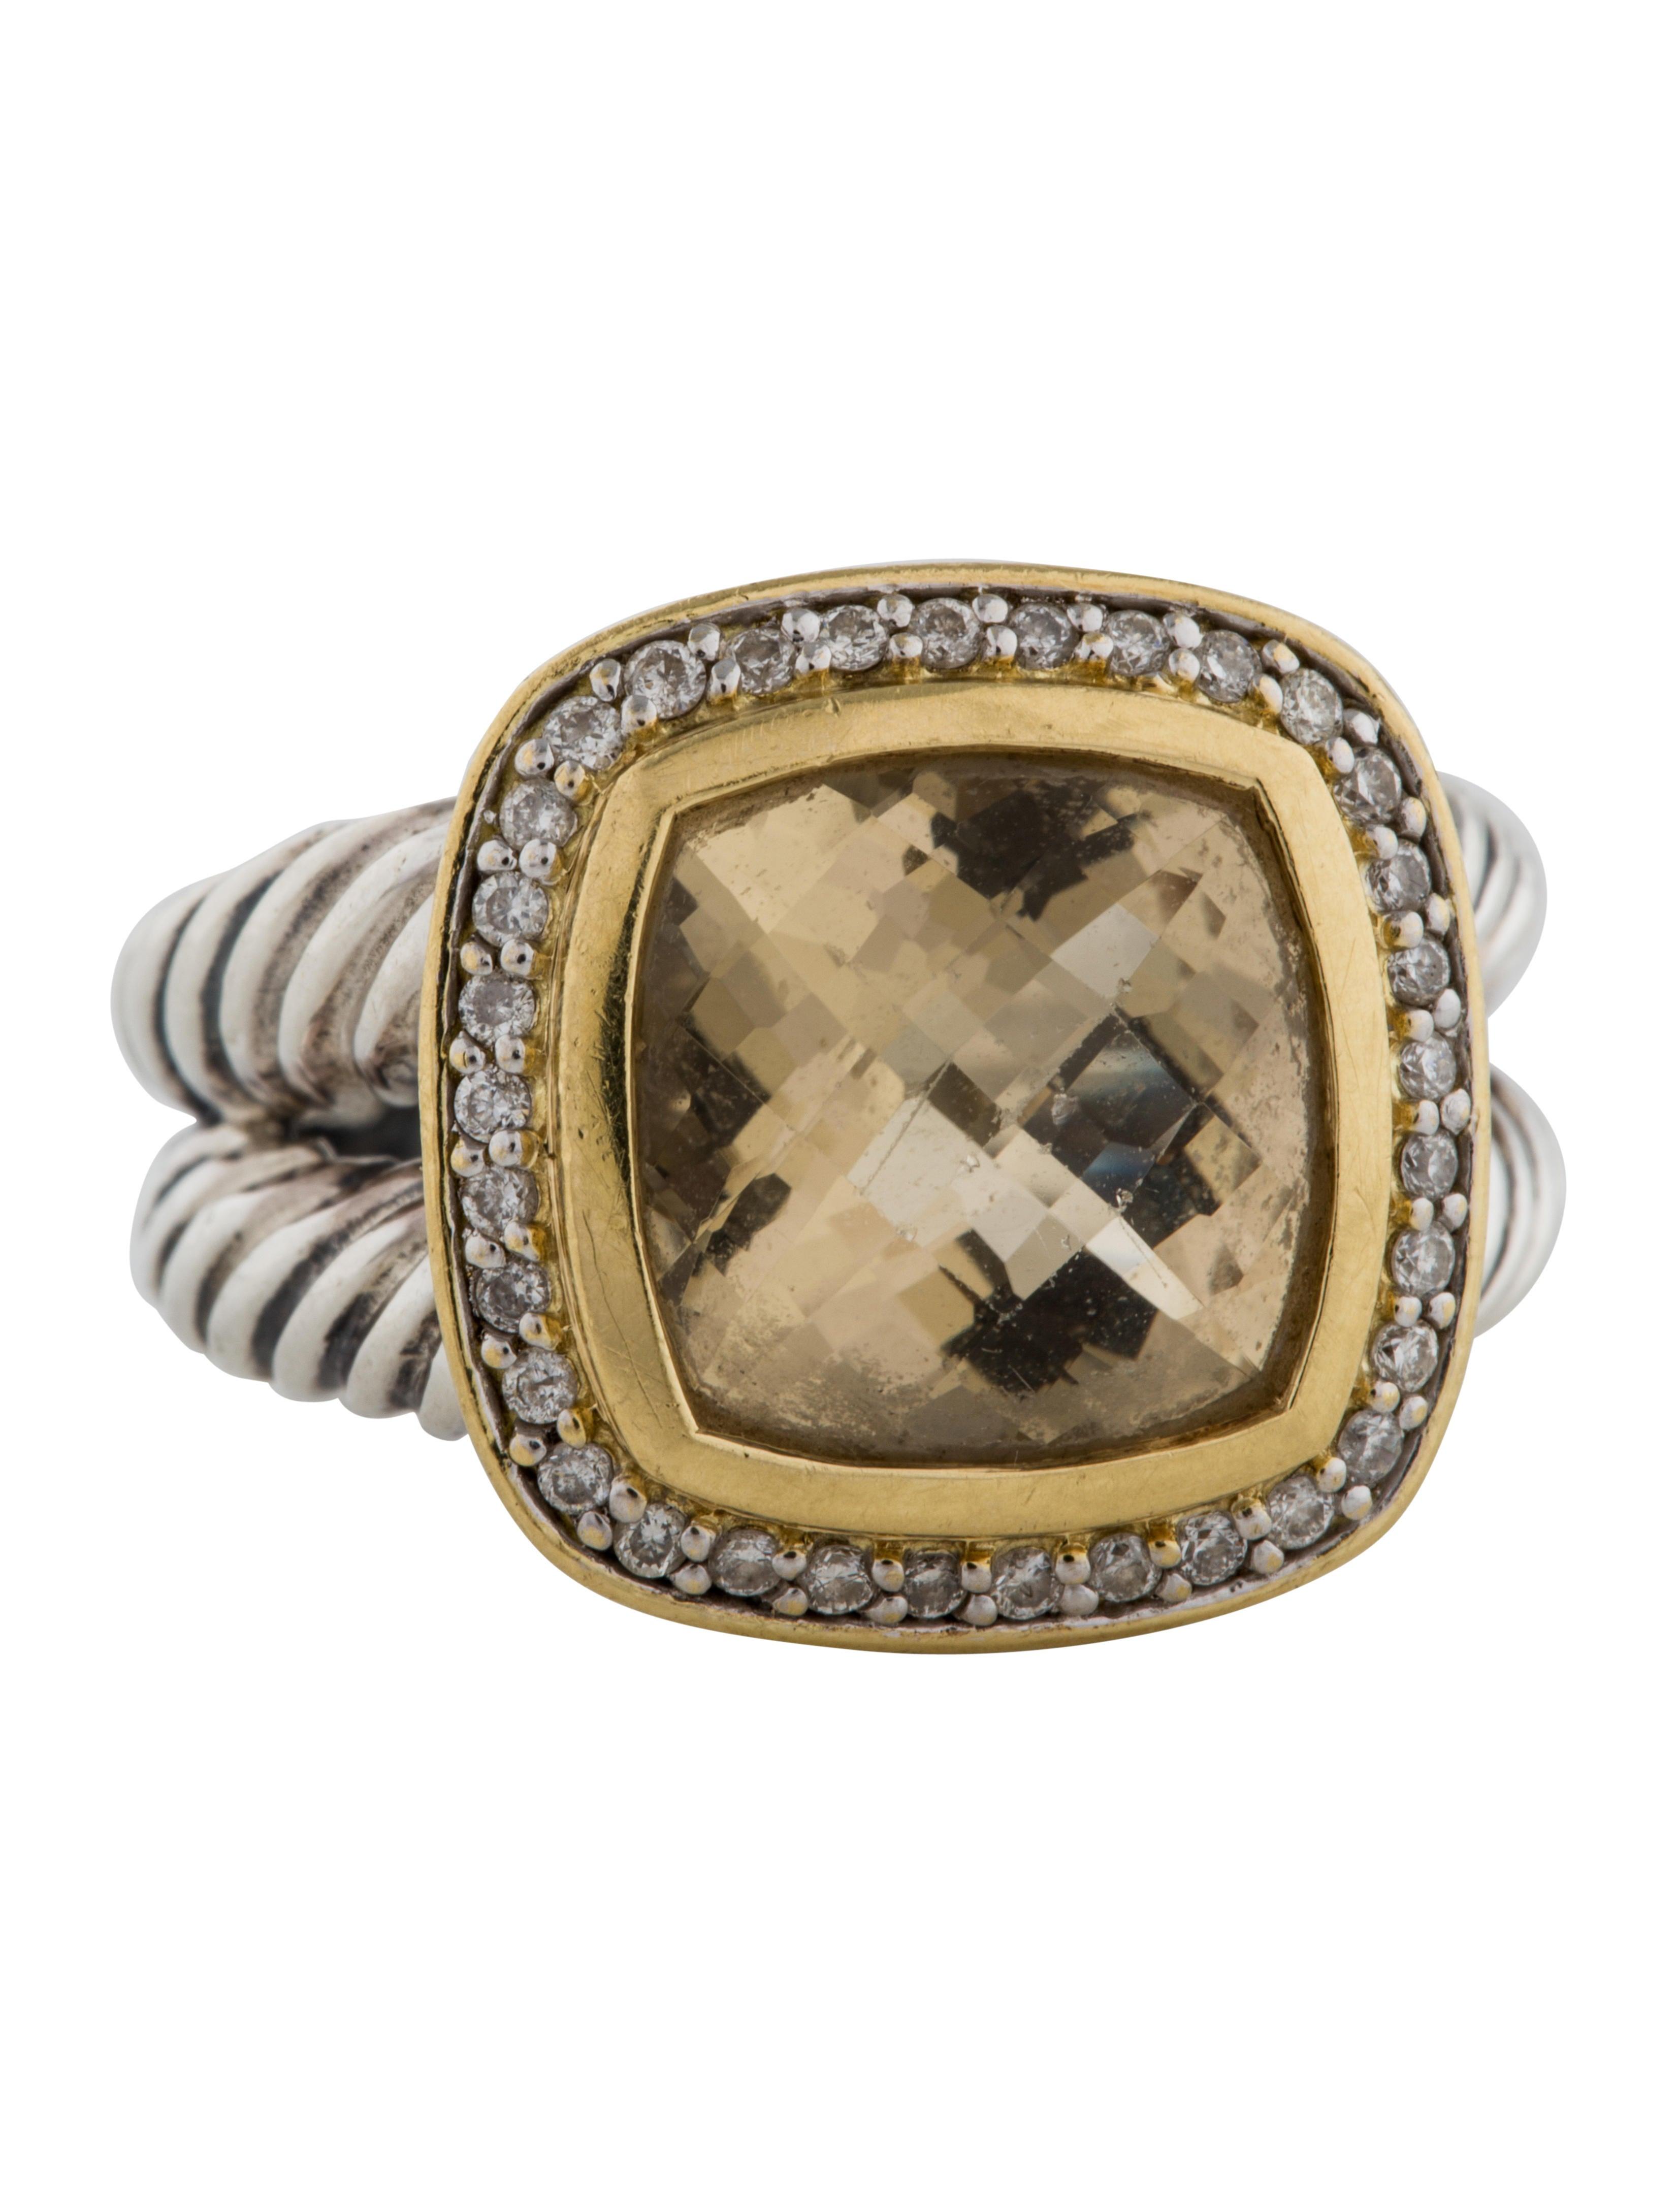 David yurman citrine diamond albion ring rings for David yurman inspired jewelry rings